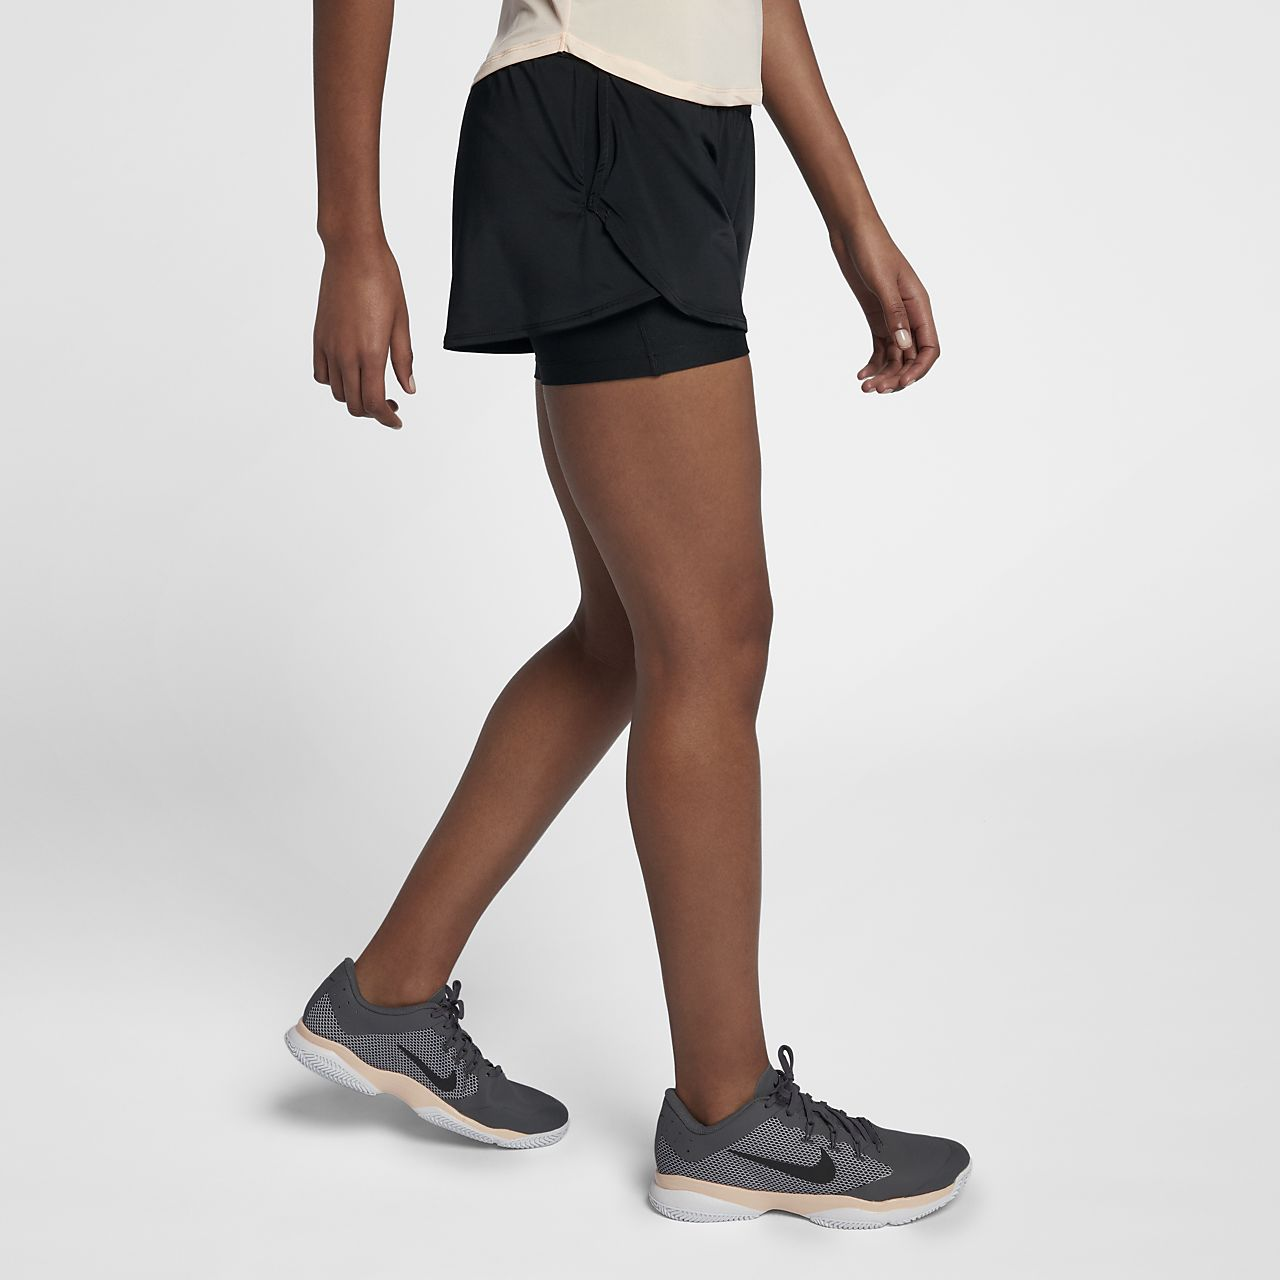 Nike Collants Running Femme b7746f31536